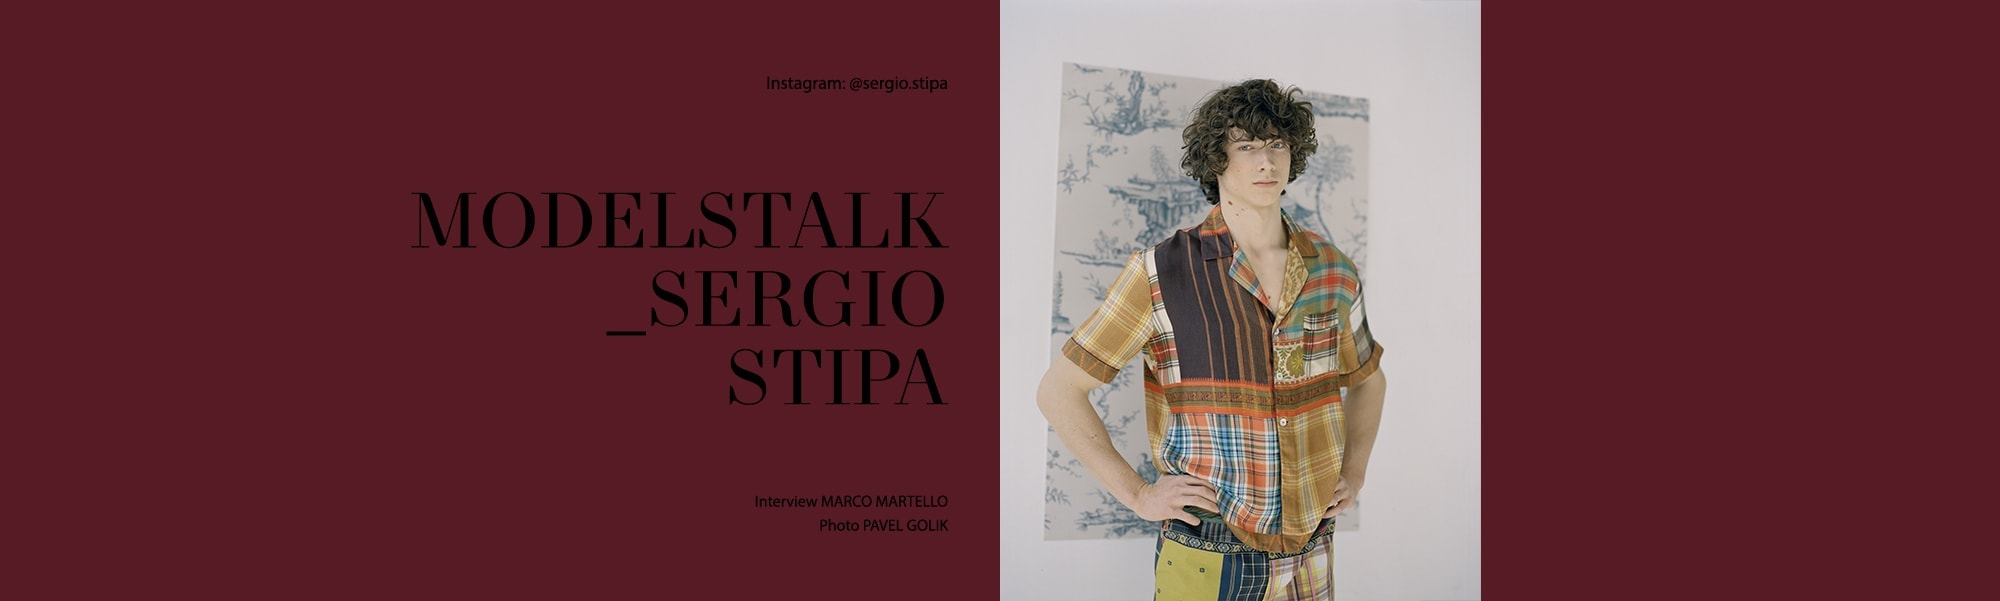 sergio-stipa-main-banner-thegreatestmagazine-talking-heads